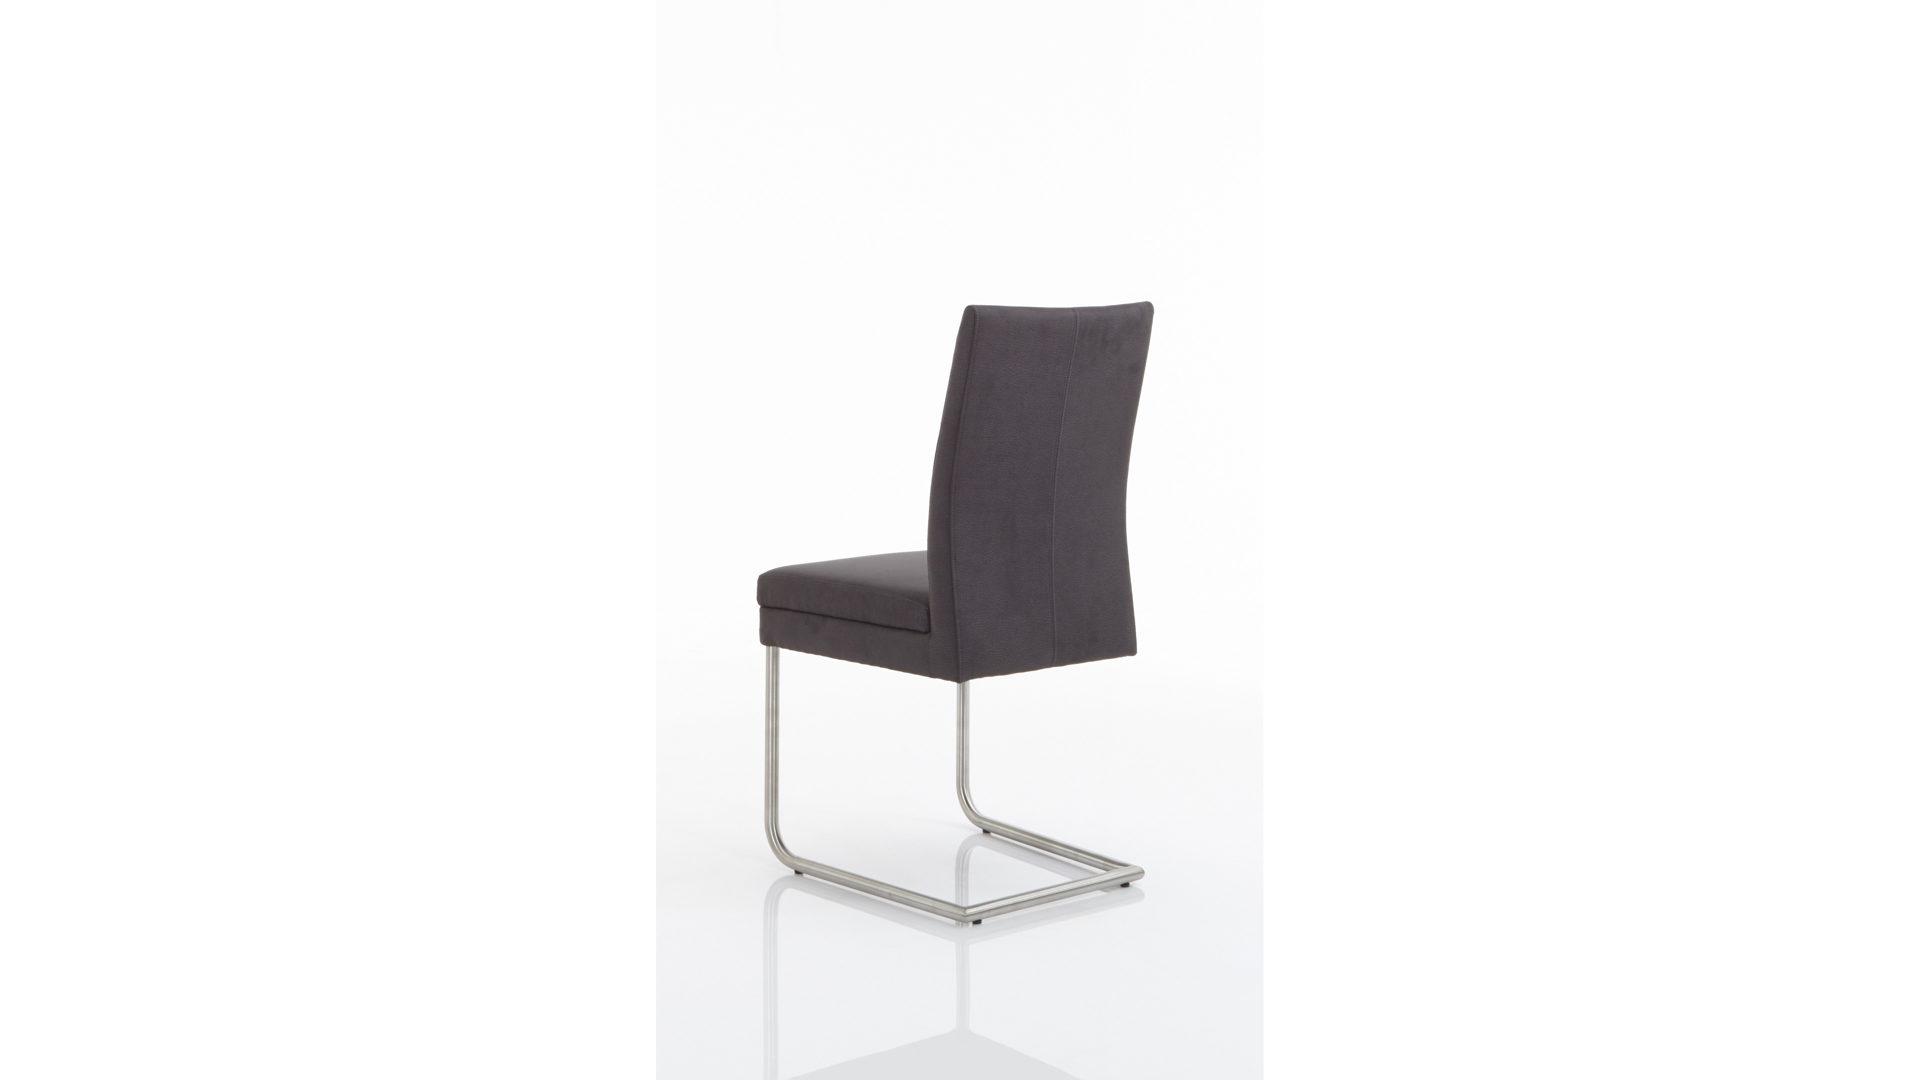 Möbel Bohn Crailsheim Möbel A Z Stühle Bänke Schwingstühle